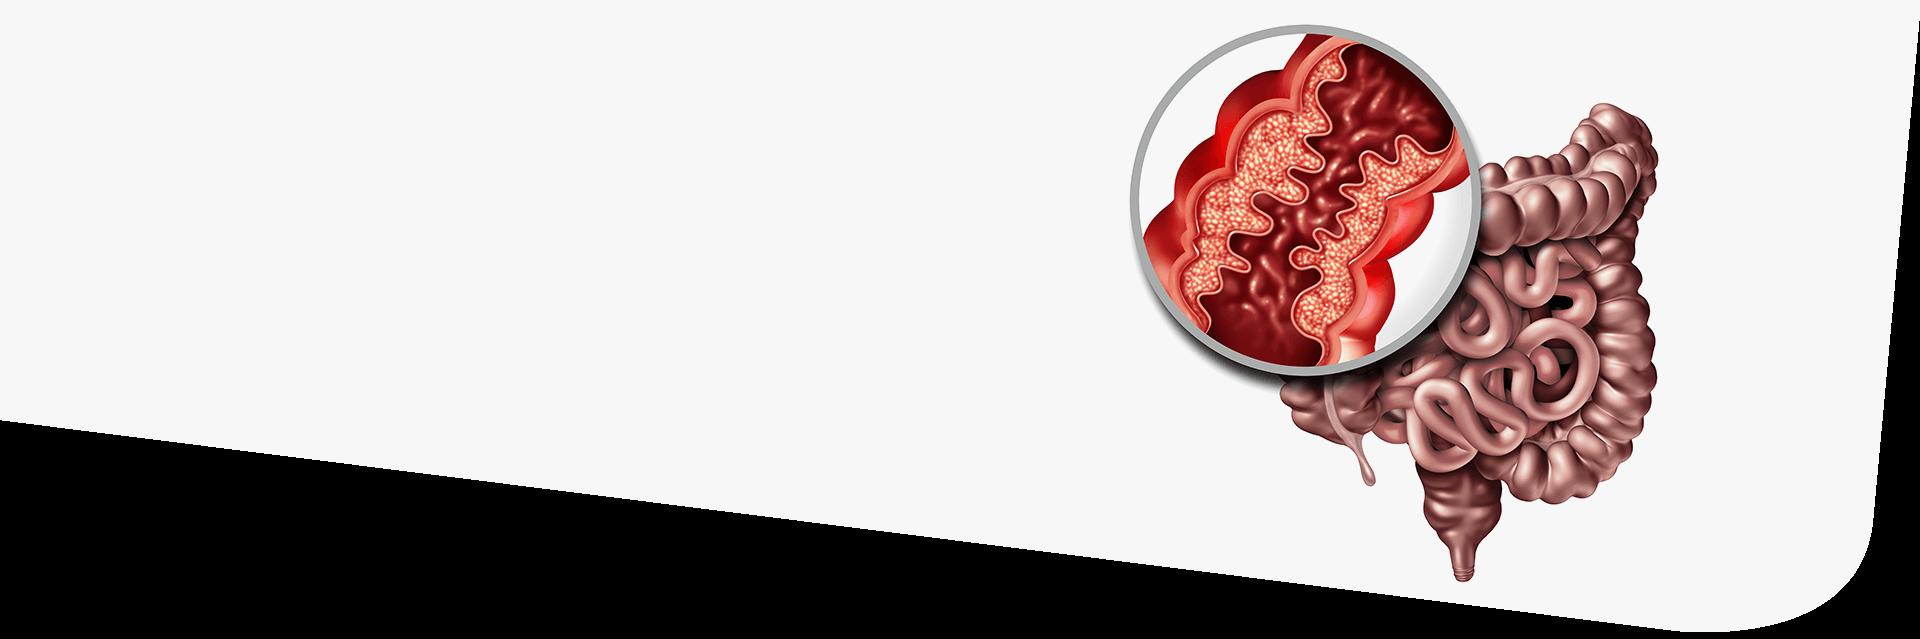 crohn-disease-bg